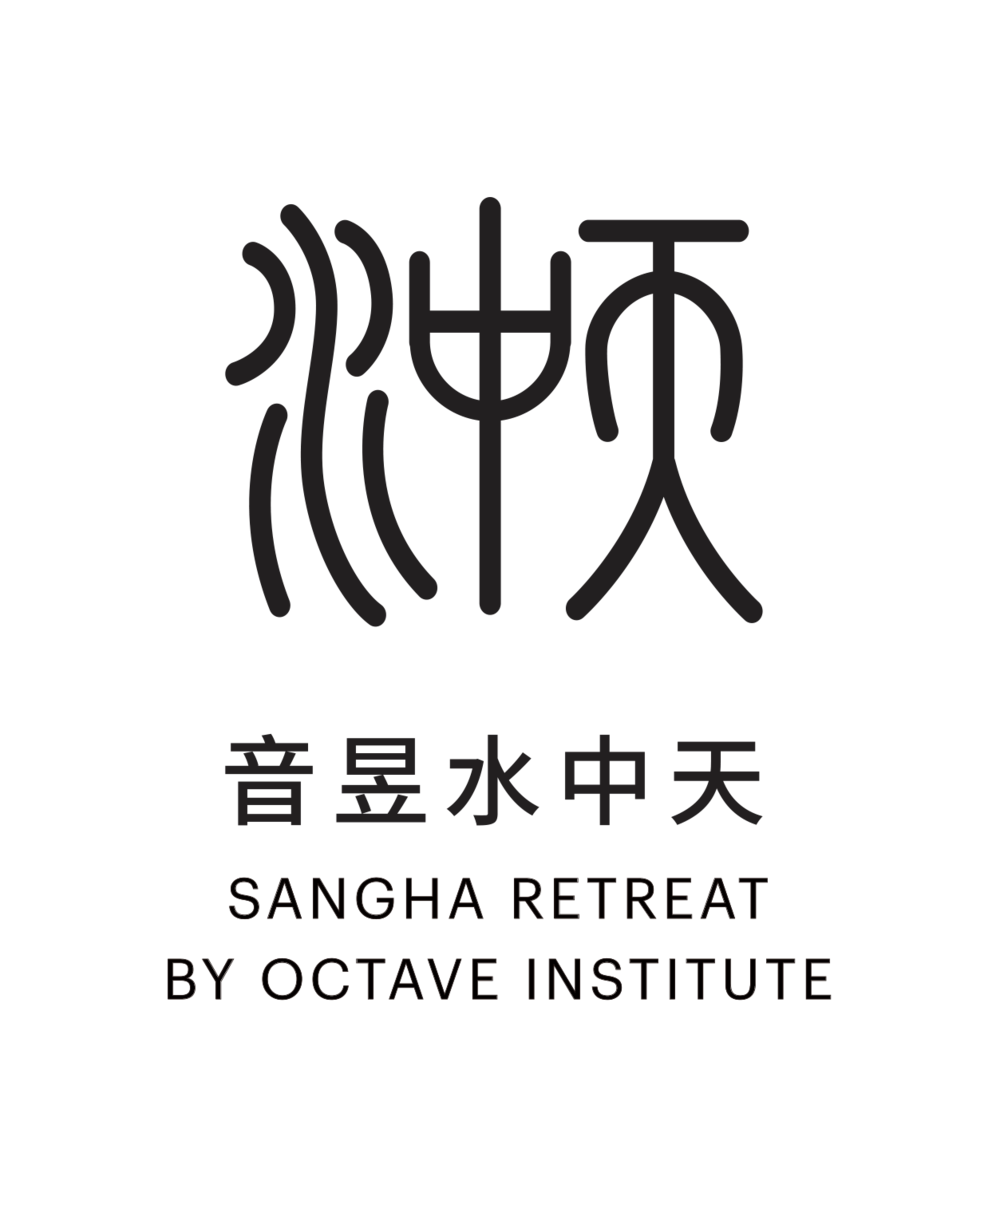 sangha-logo-20190329.png